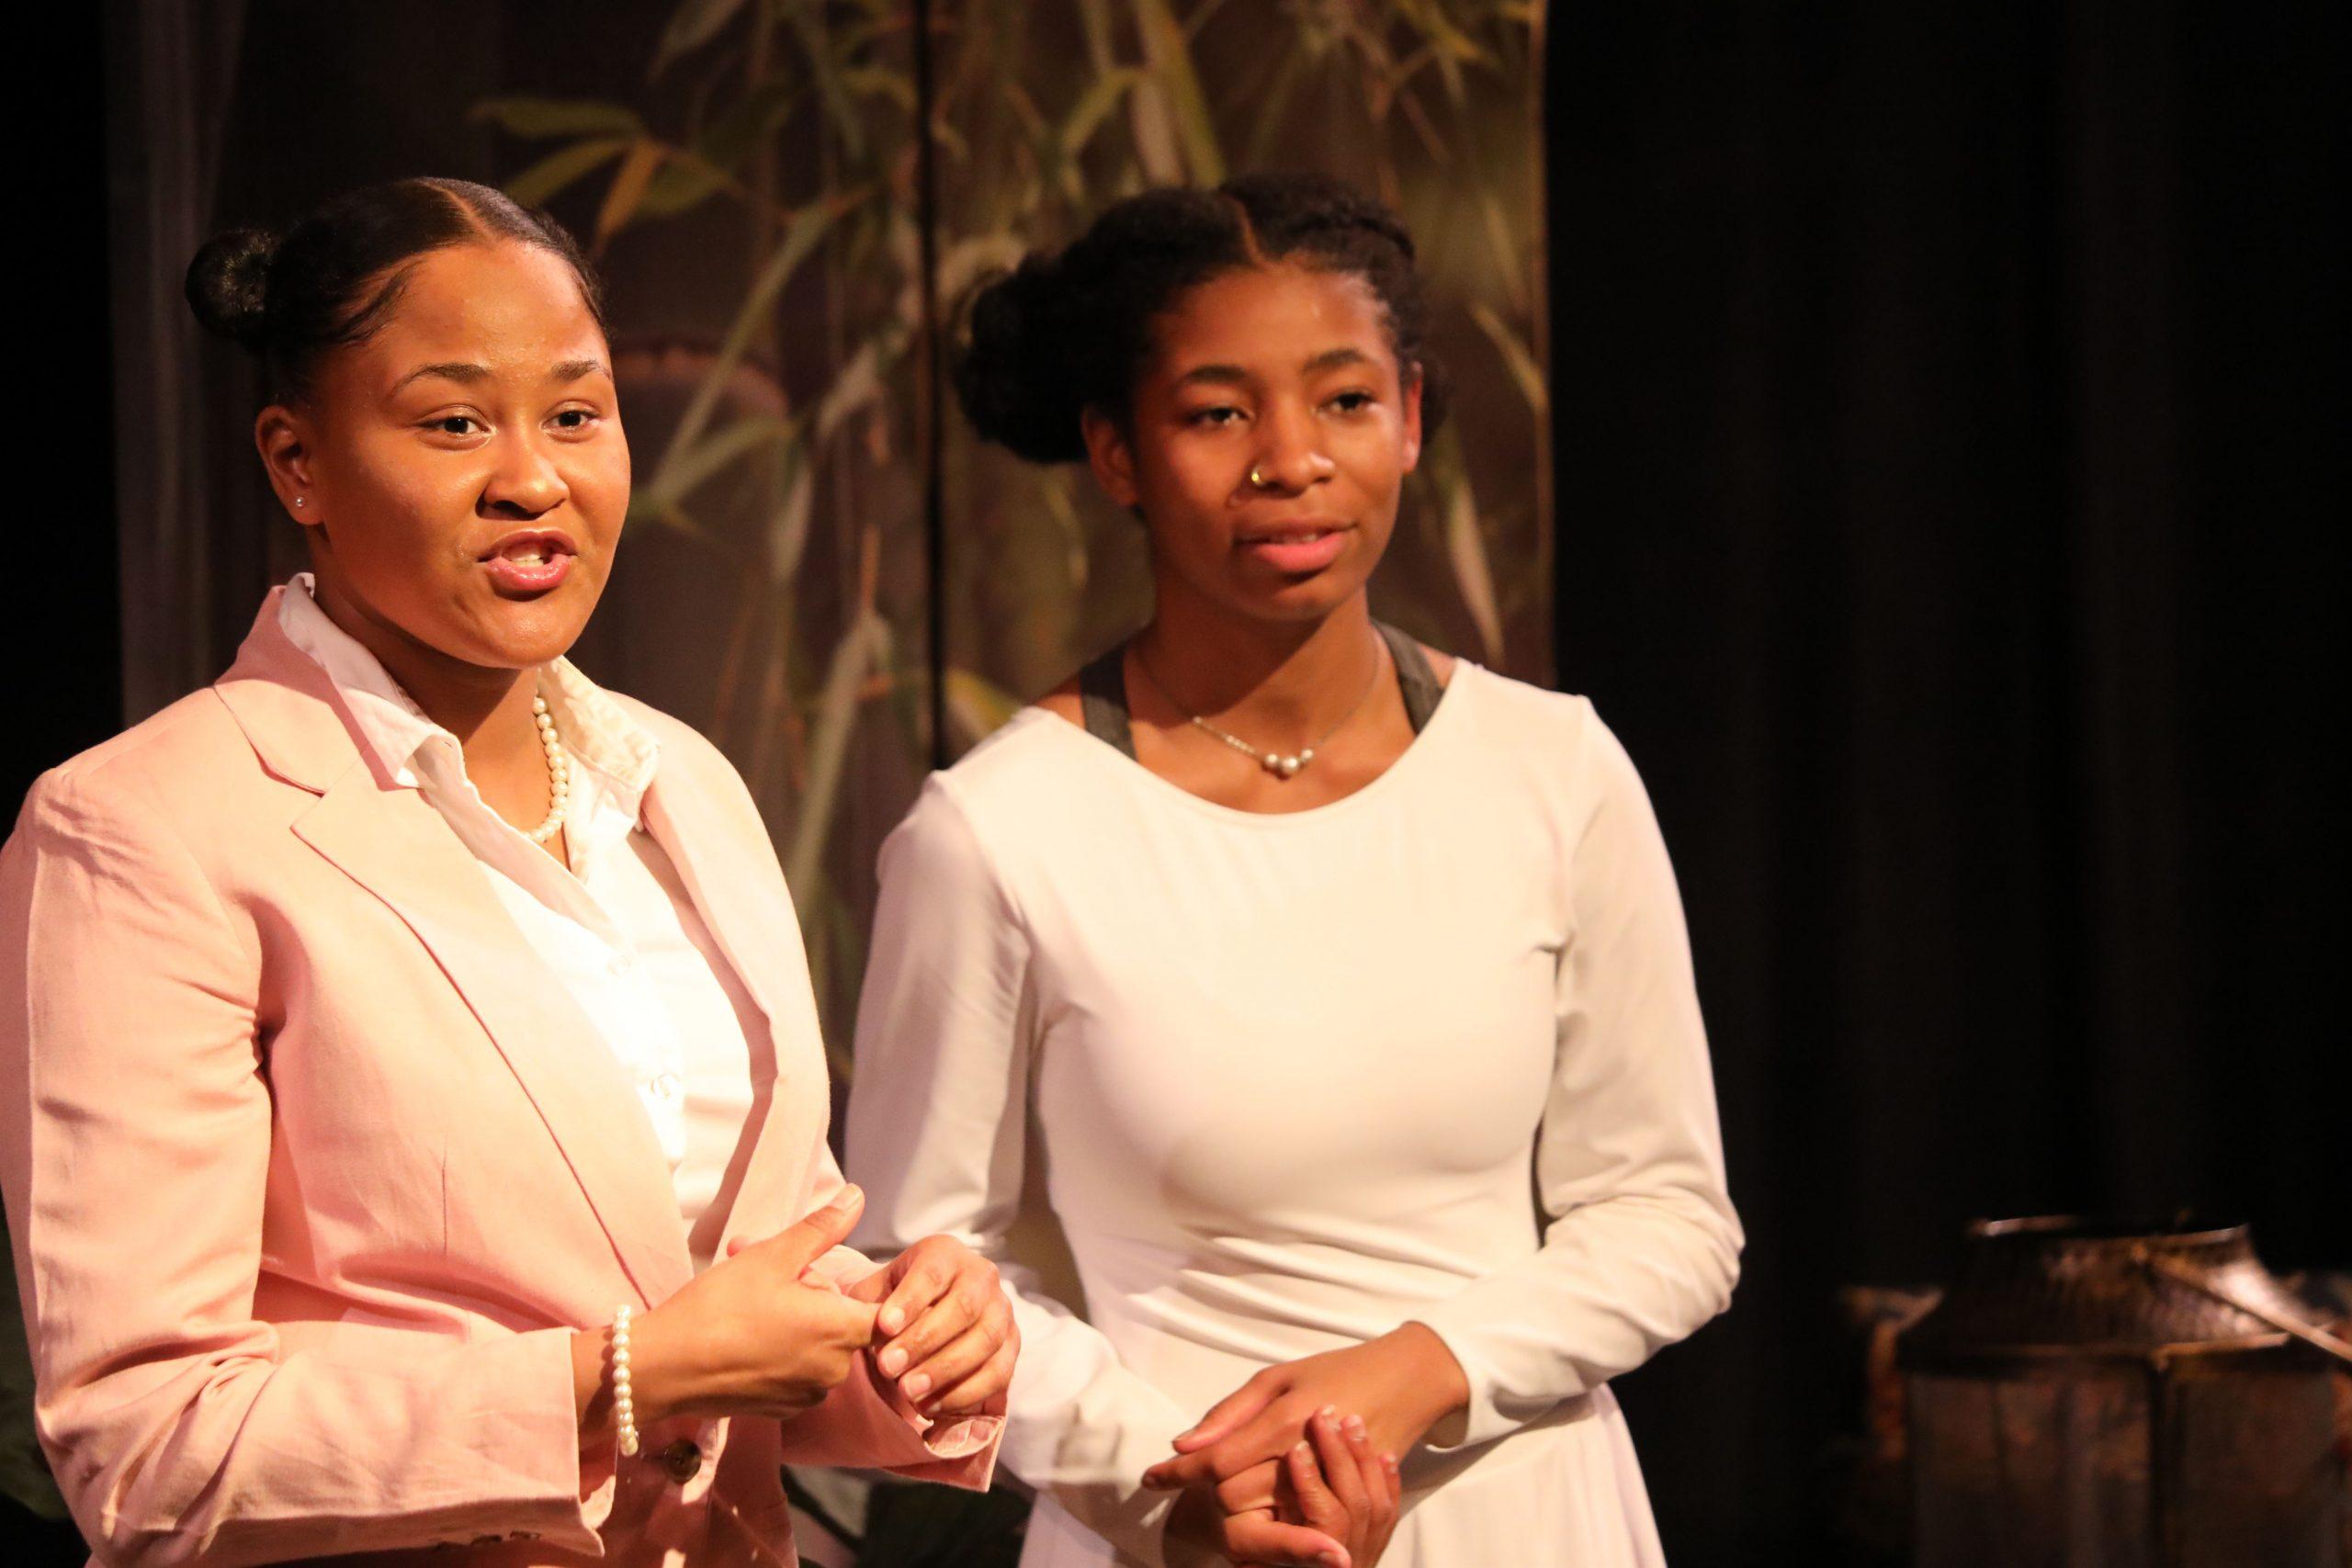 Black Girl Think Tank Event-Black Girl Mental Health Campaign